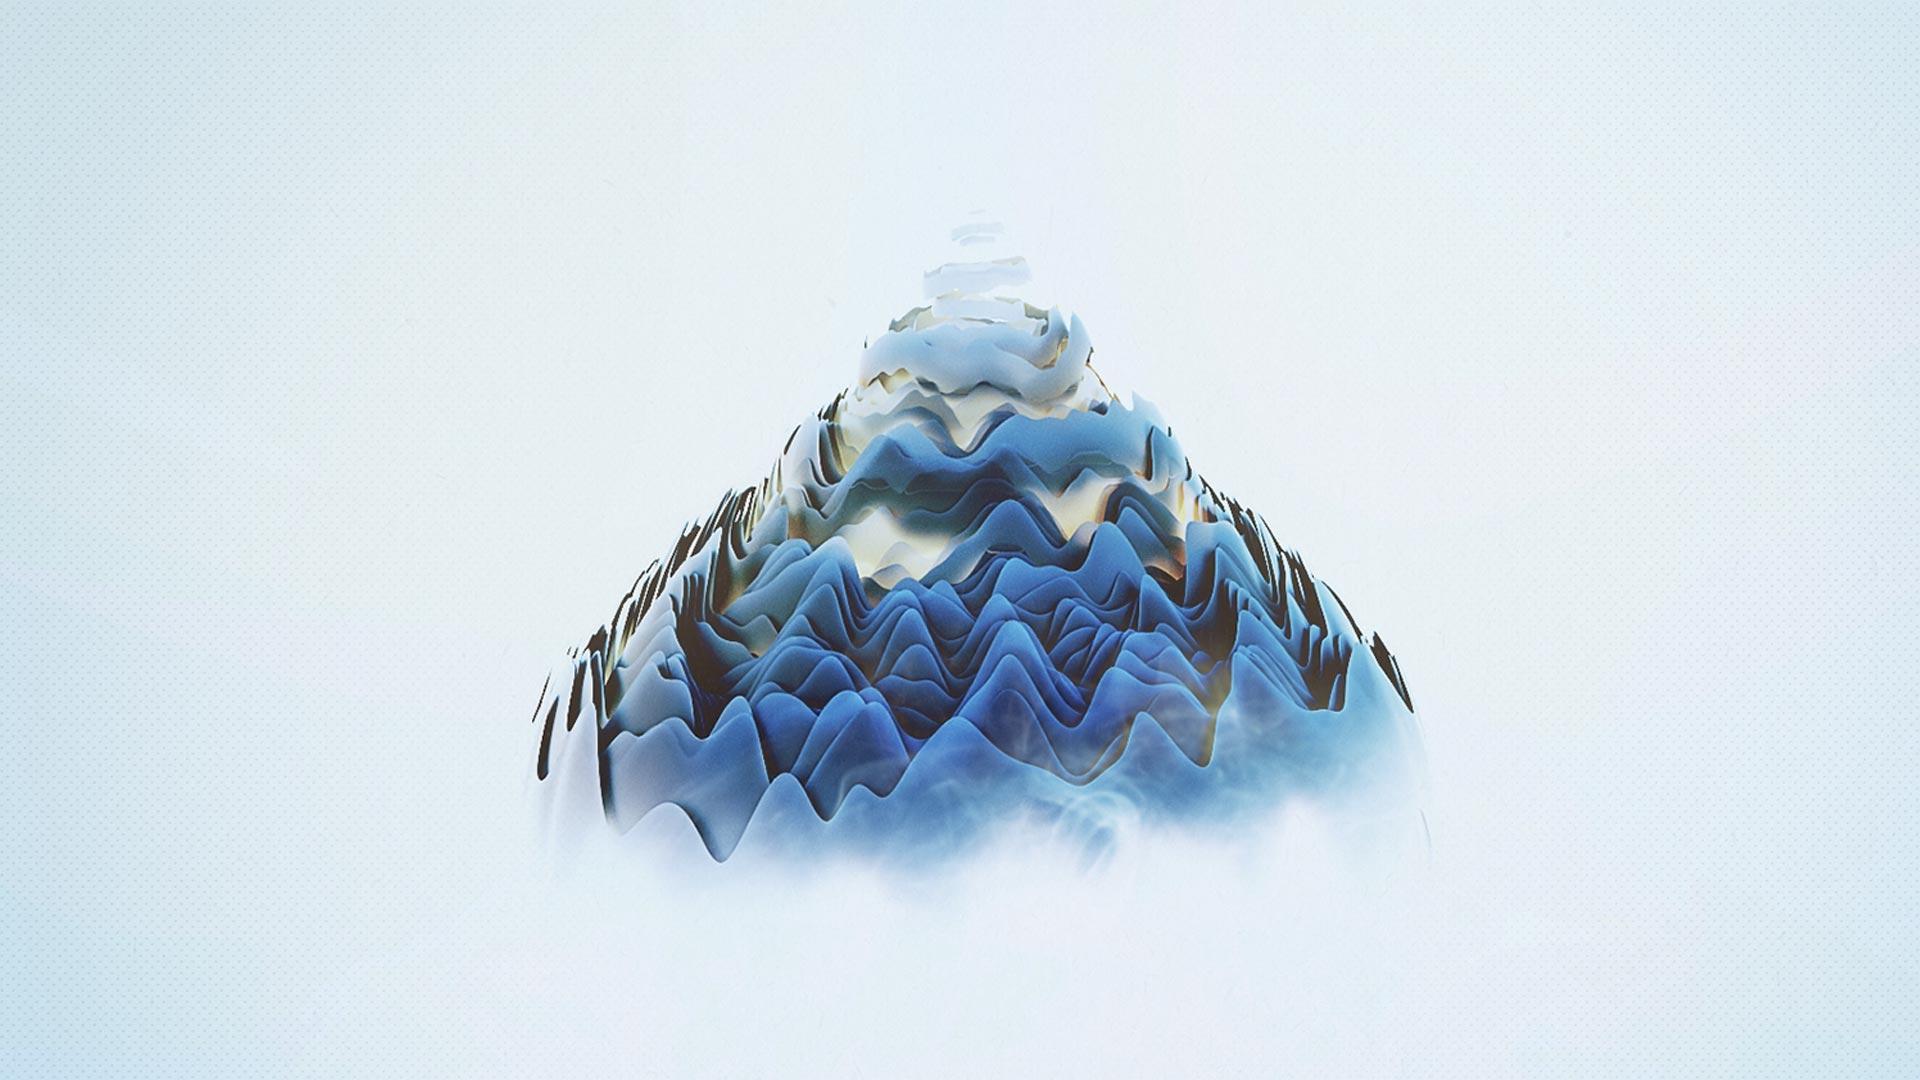 Peaks_001